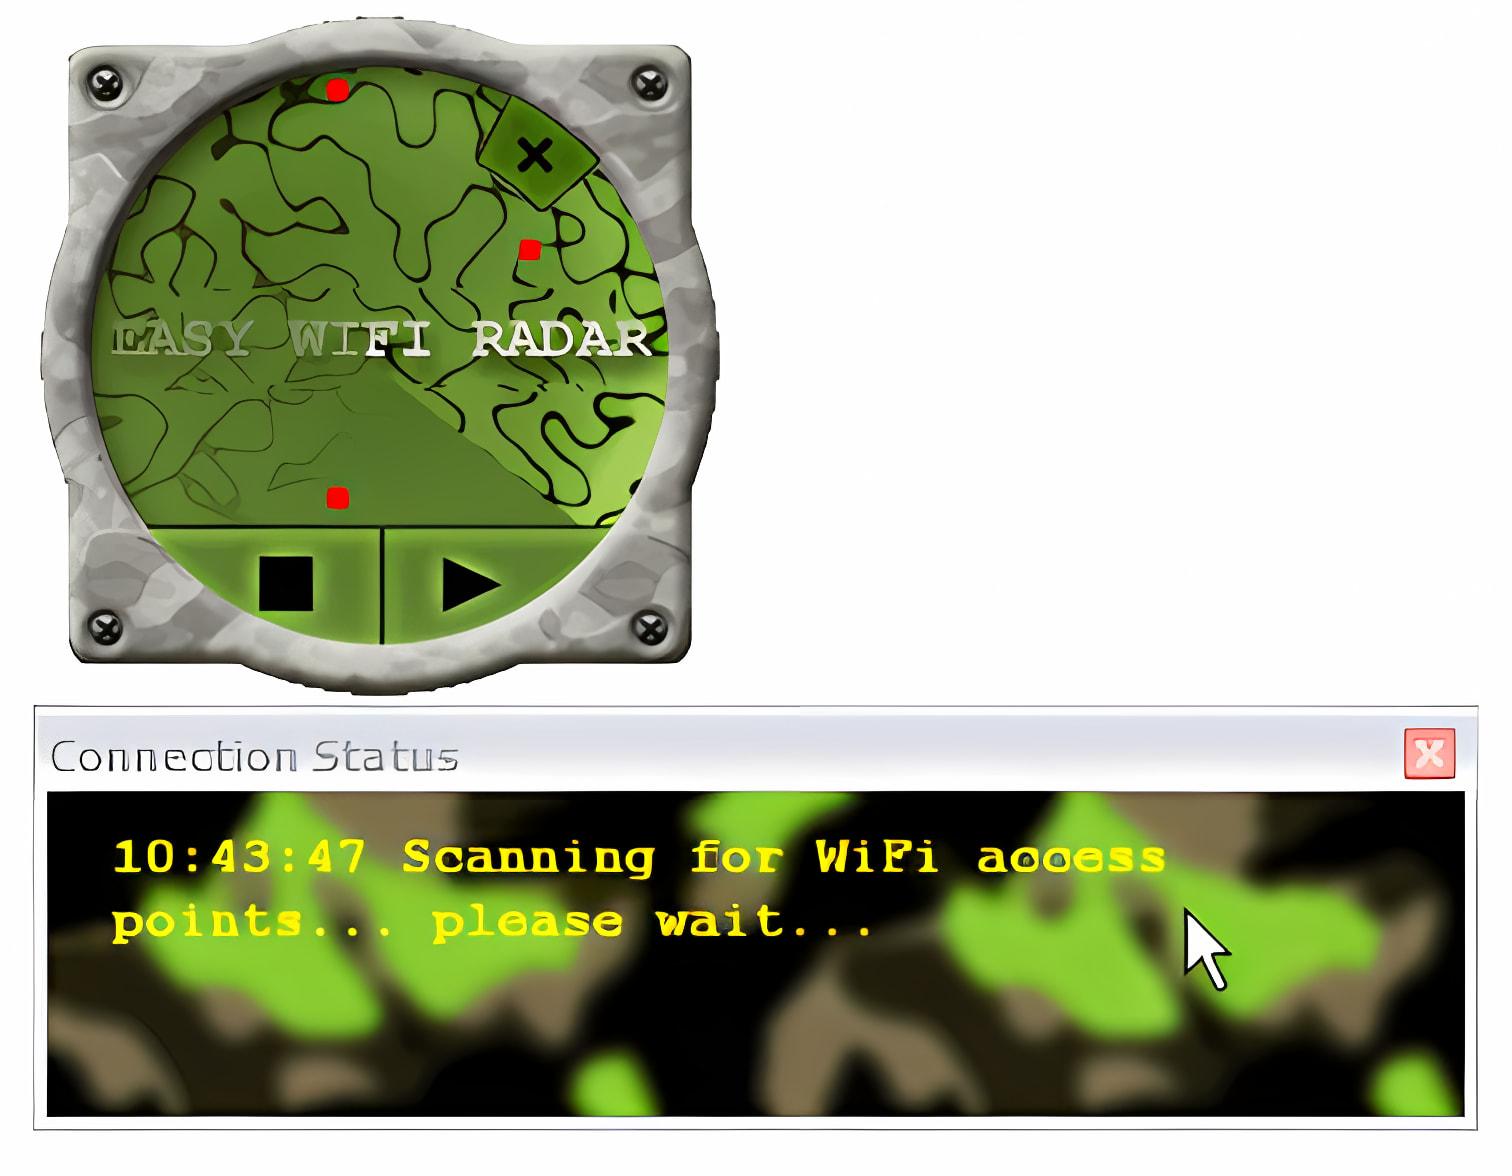 Easy WIFI Radar